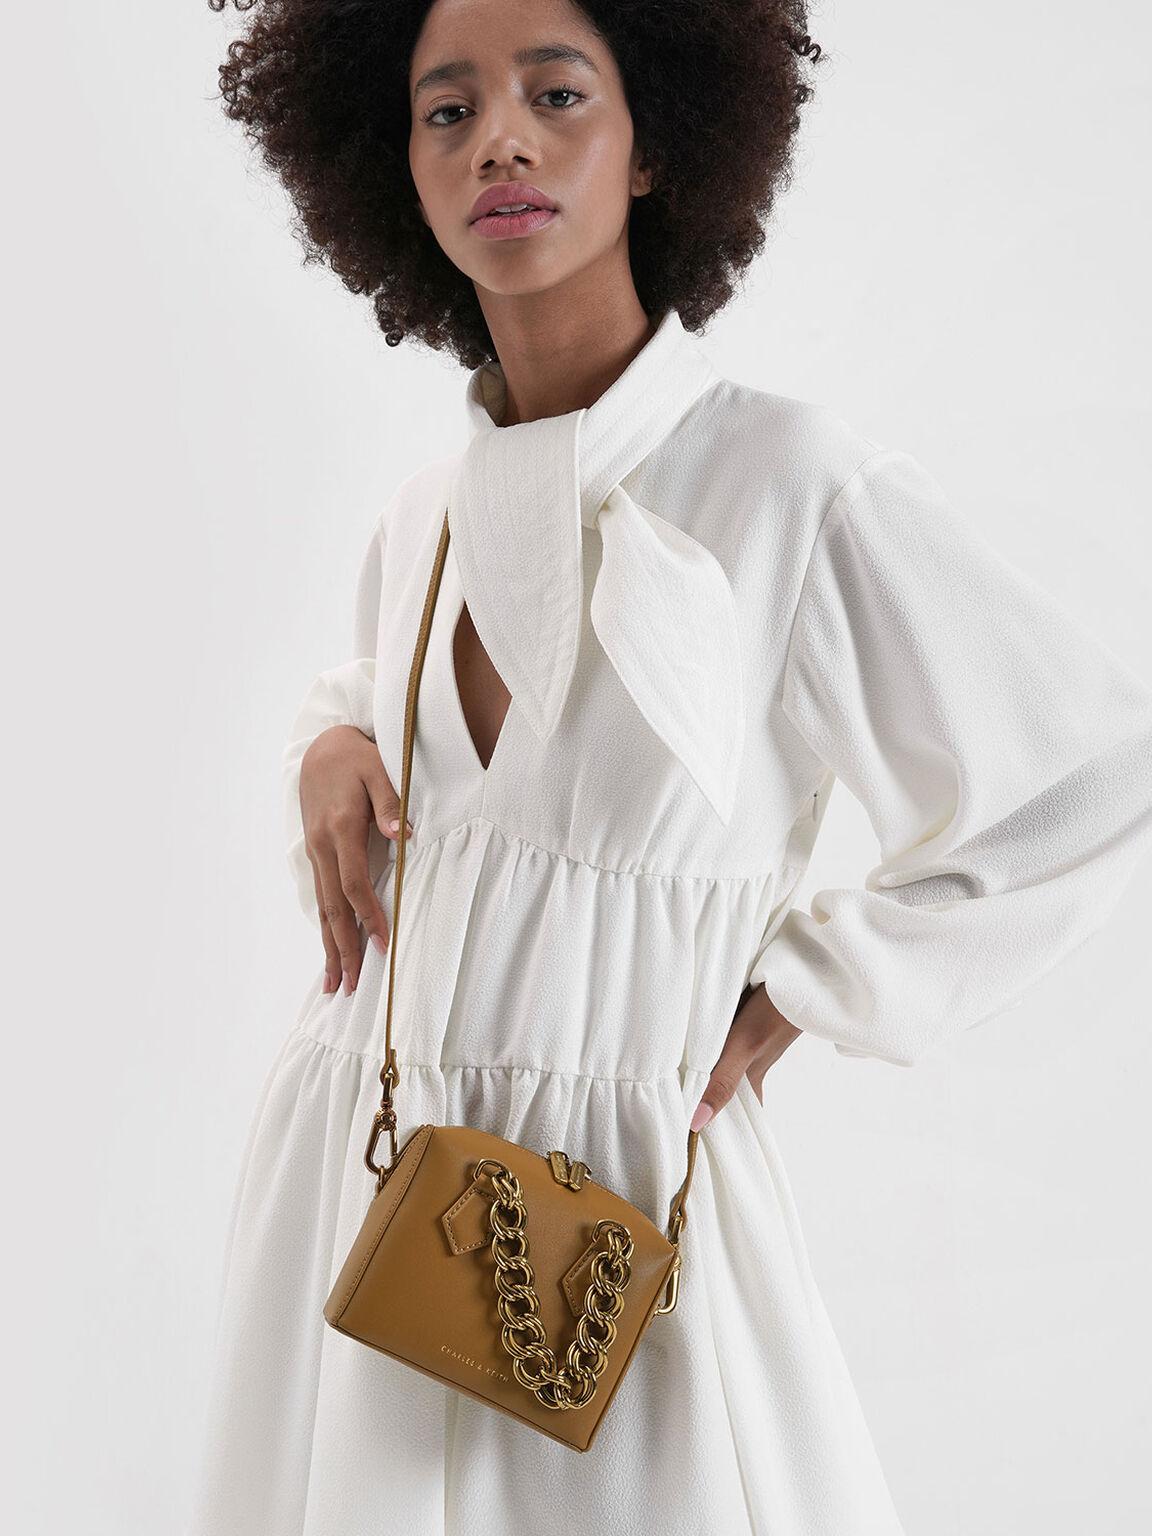 Square Chunky Chain Handle Crossbody Bag, Caramel, hi-res